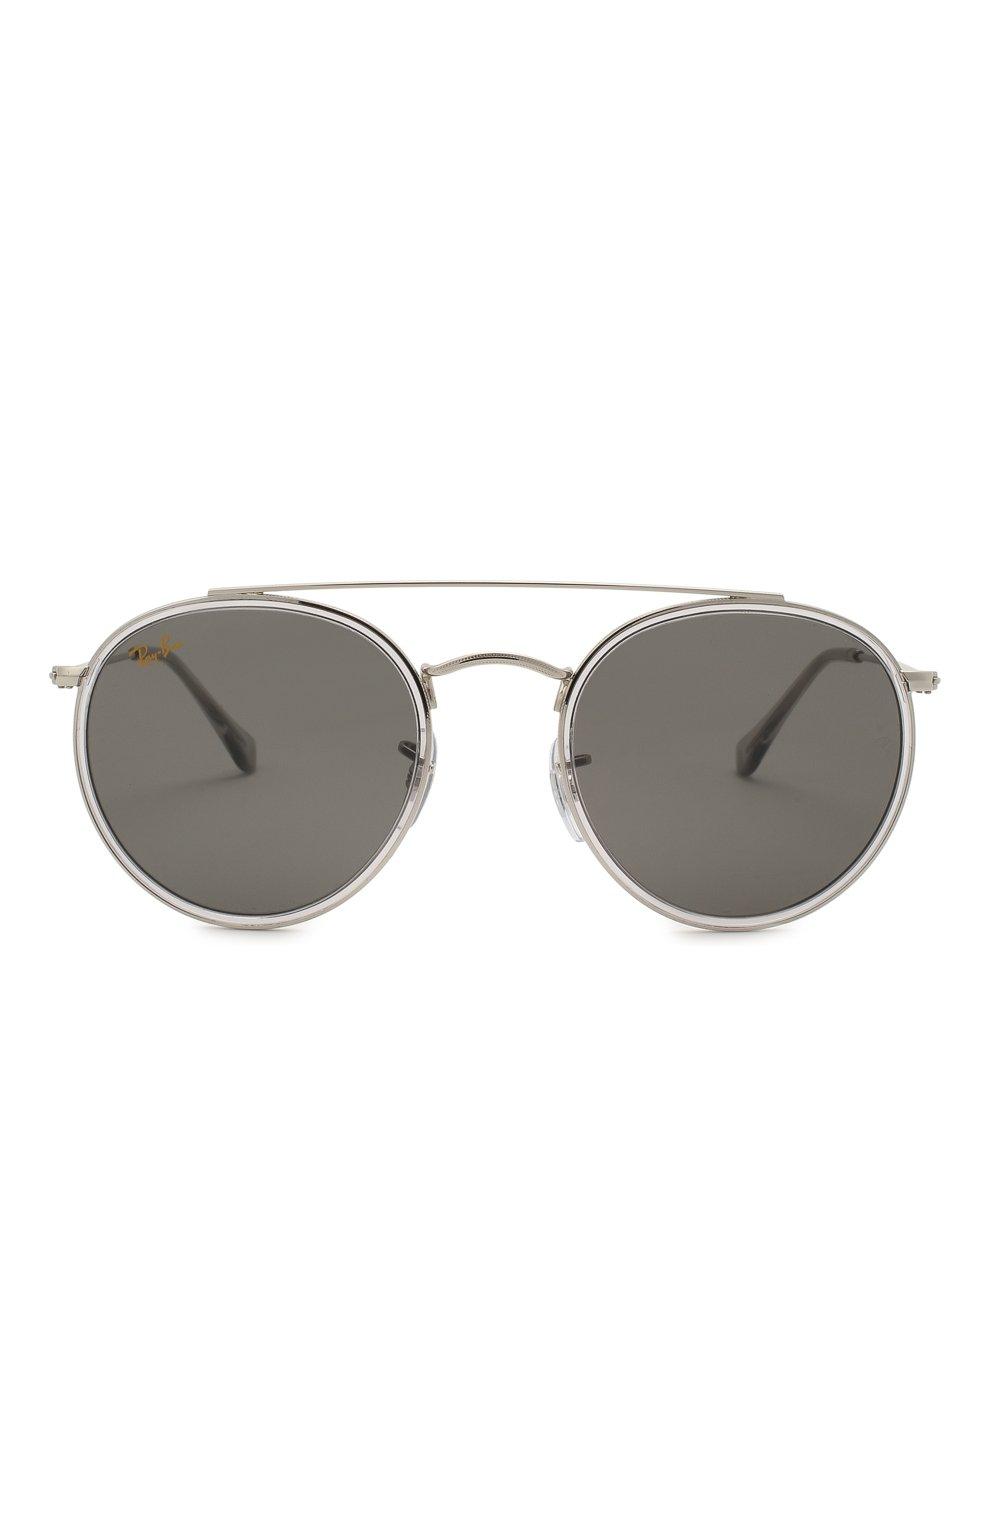 Женские солнцезащитные очки RAY-BAN серого цвета, арт. 3647N-9211B1 | Фото 4